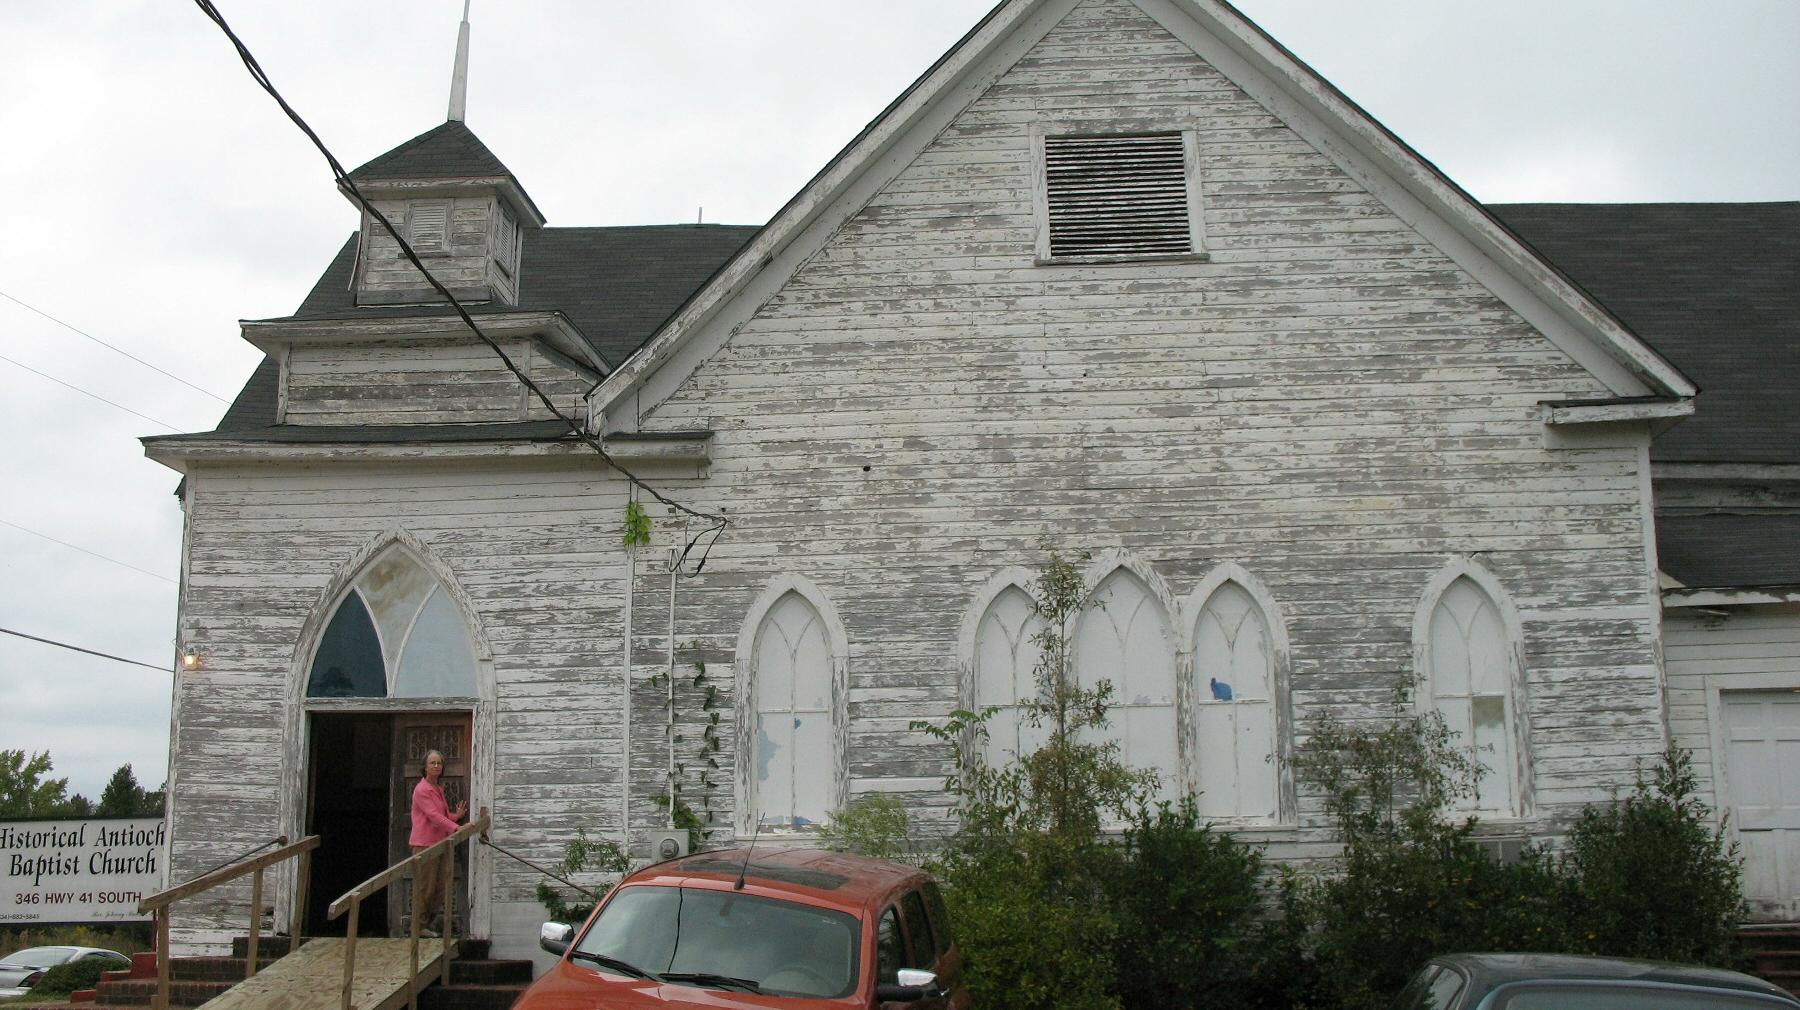 Alabama wilcox county camden - Antioch Baptist Church During Renovation